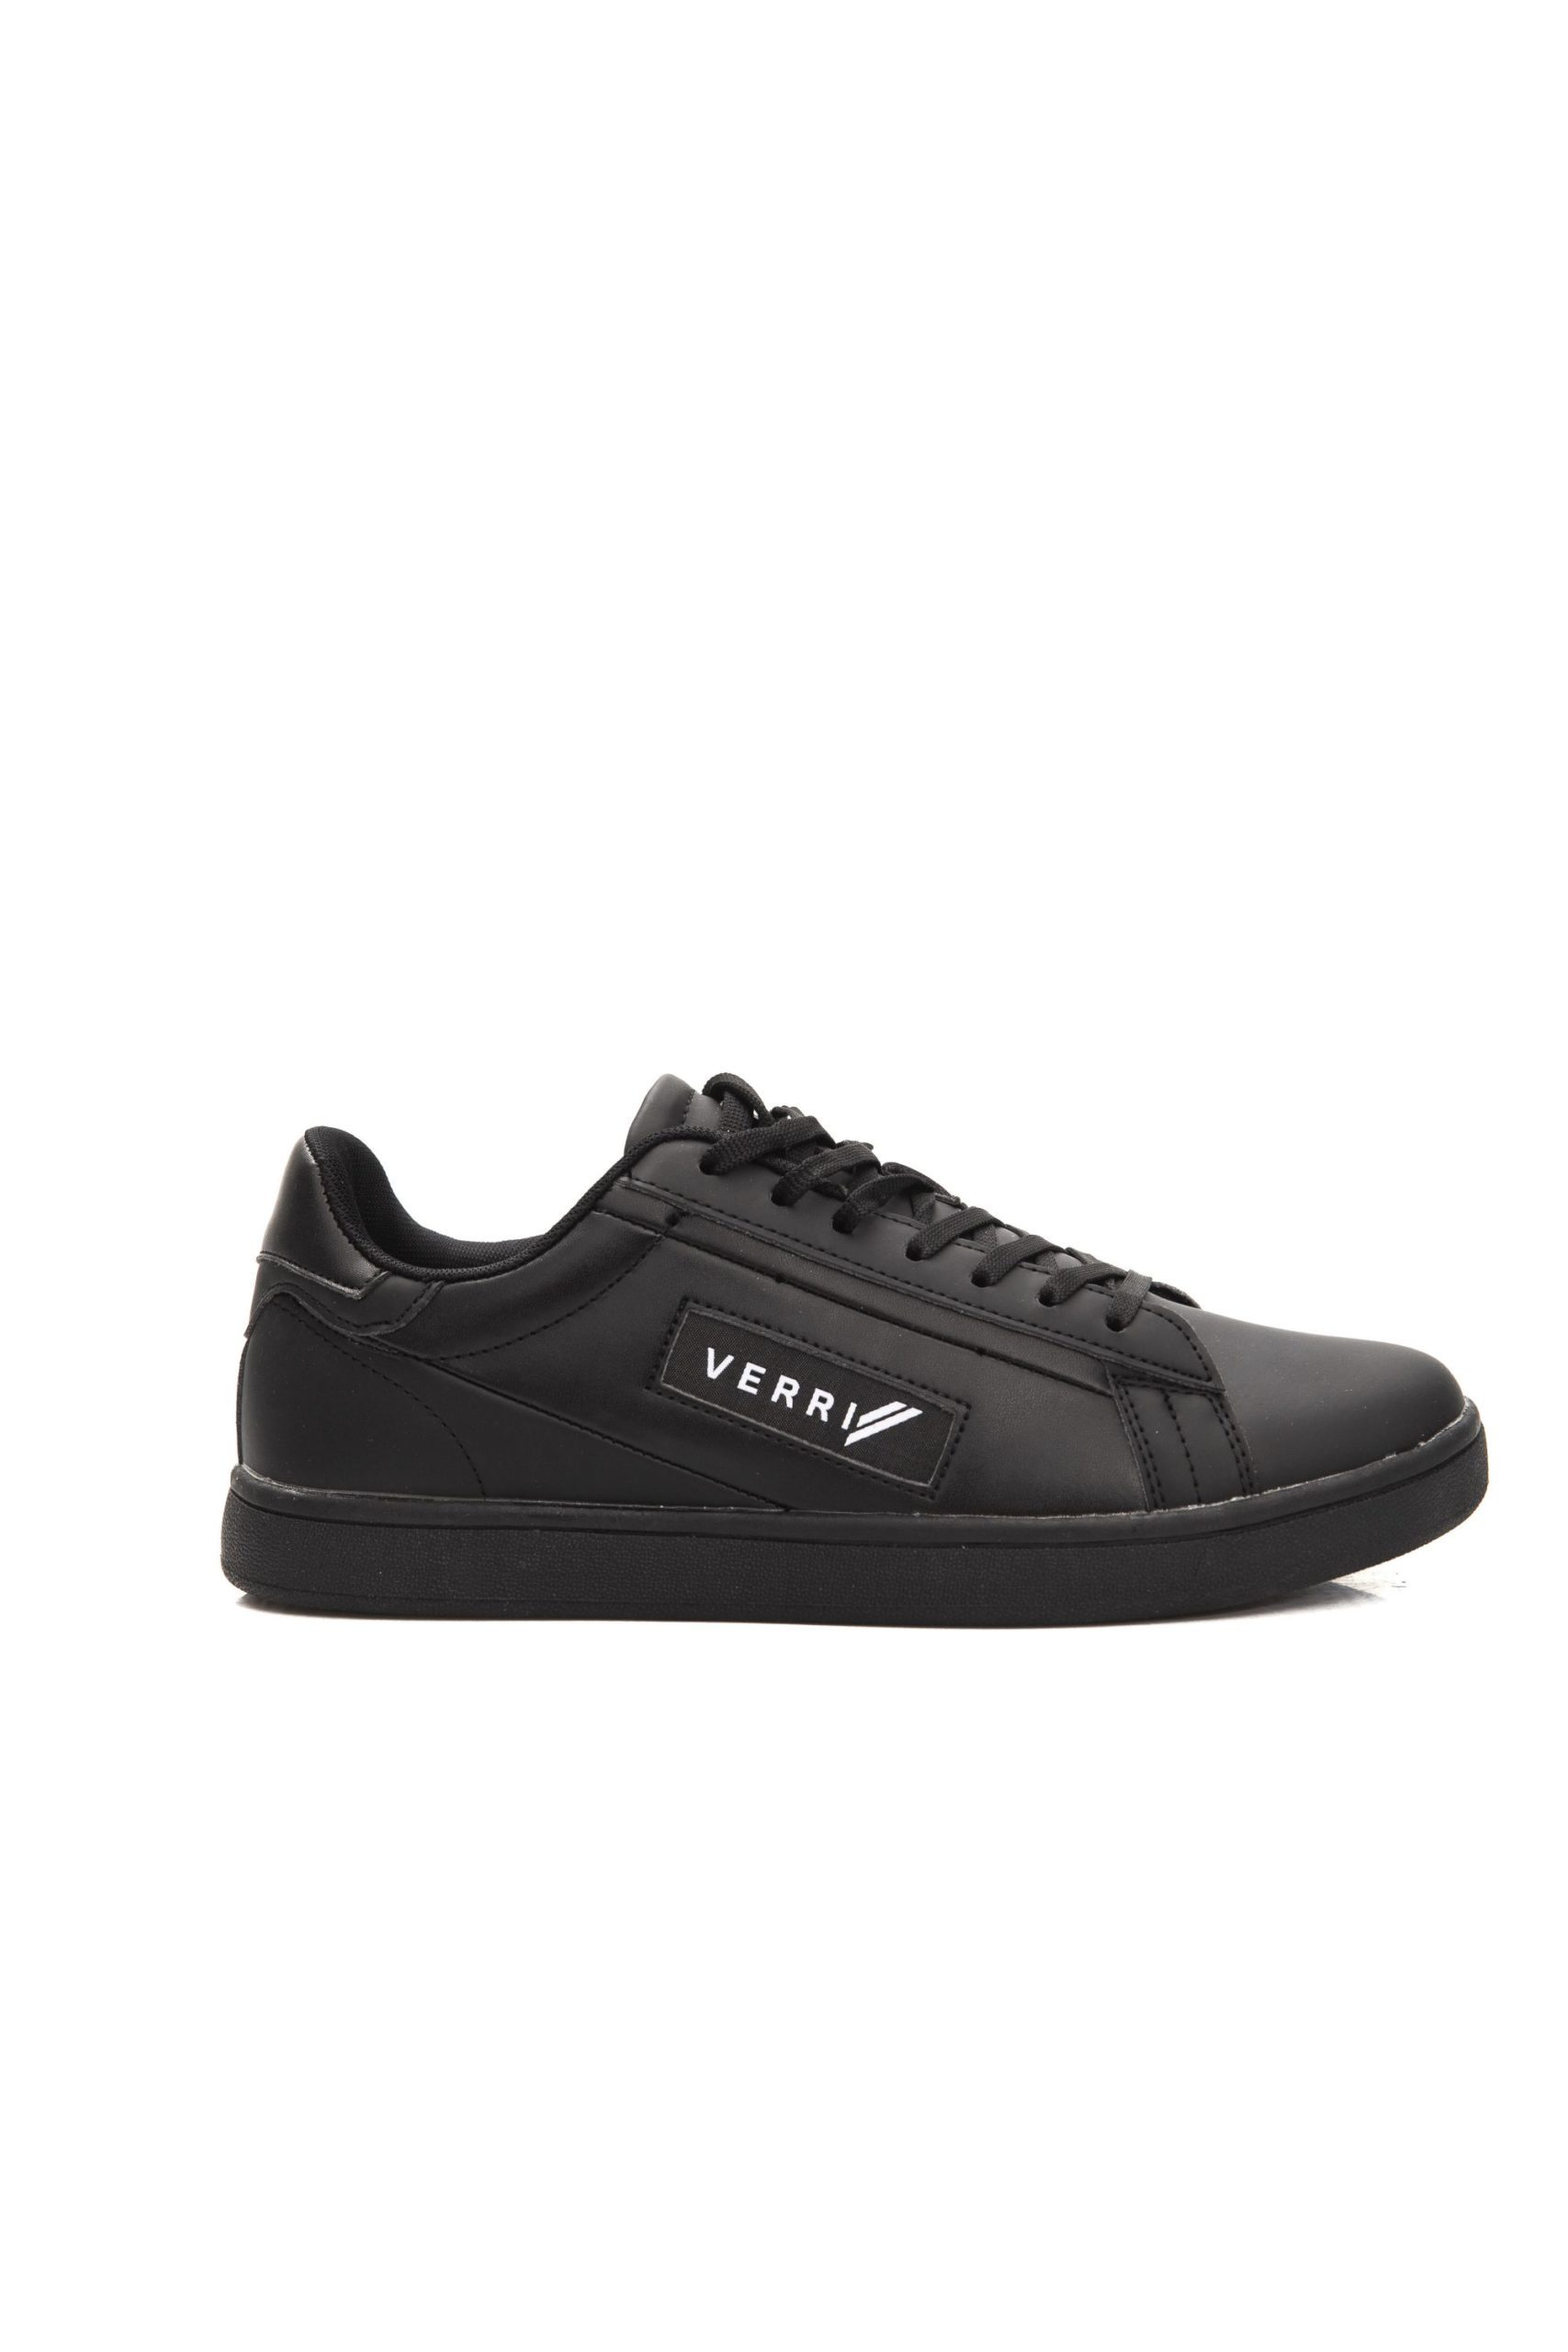 Verri Men's Trainers Black VE664788 - EU44/US11